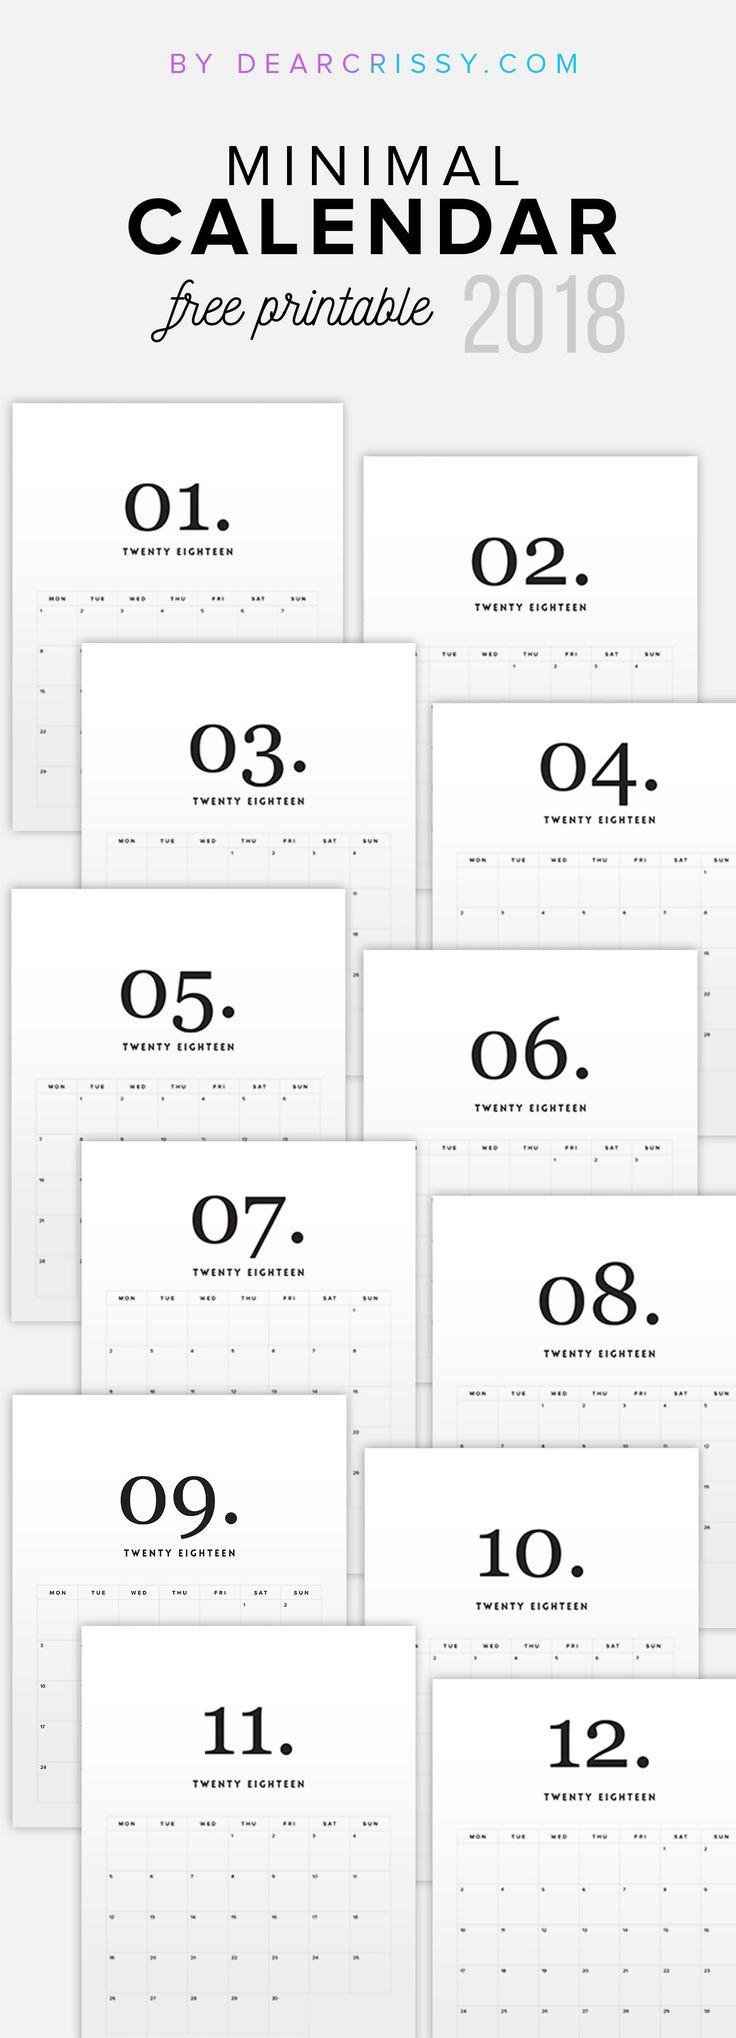 Free Printable 2018 Minimal Calendar - Modern Calendar - Minimalist Calendar - Clean White Calendar 2018 - #2018Calendar #FreePrintable #Calendar #minimalist #modern #simple